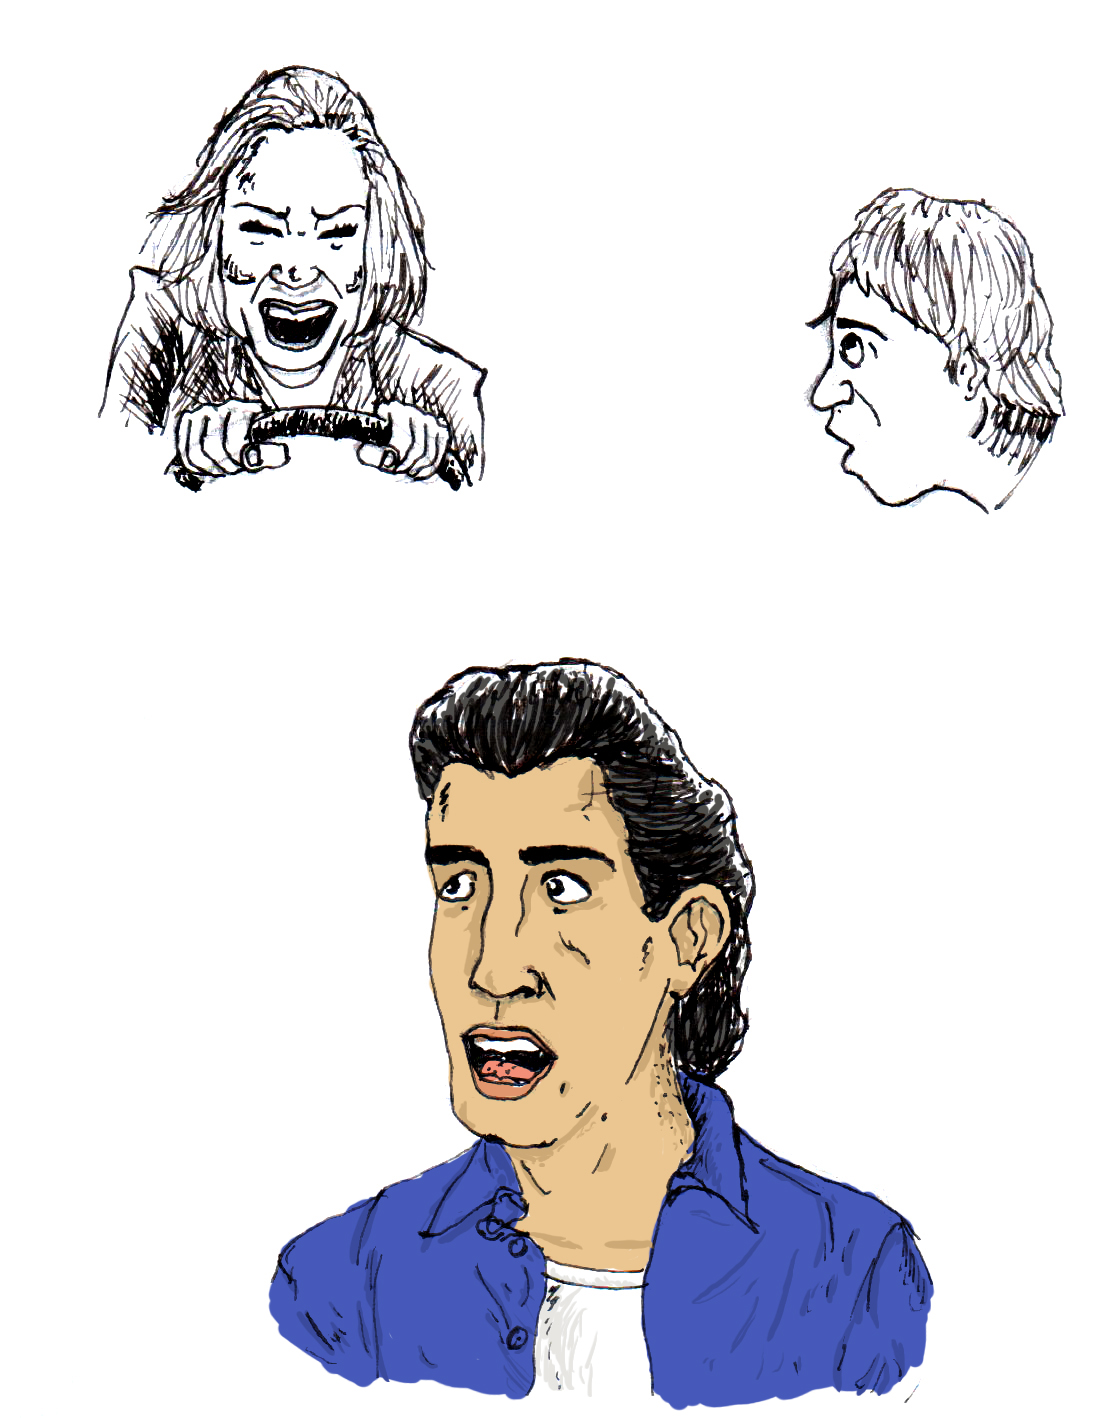 Pedro bitencourt - Aprender a pintar ...